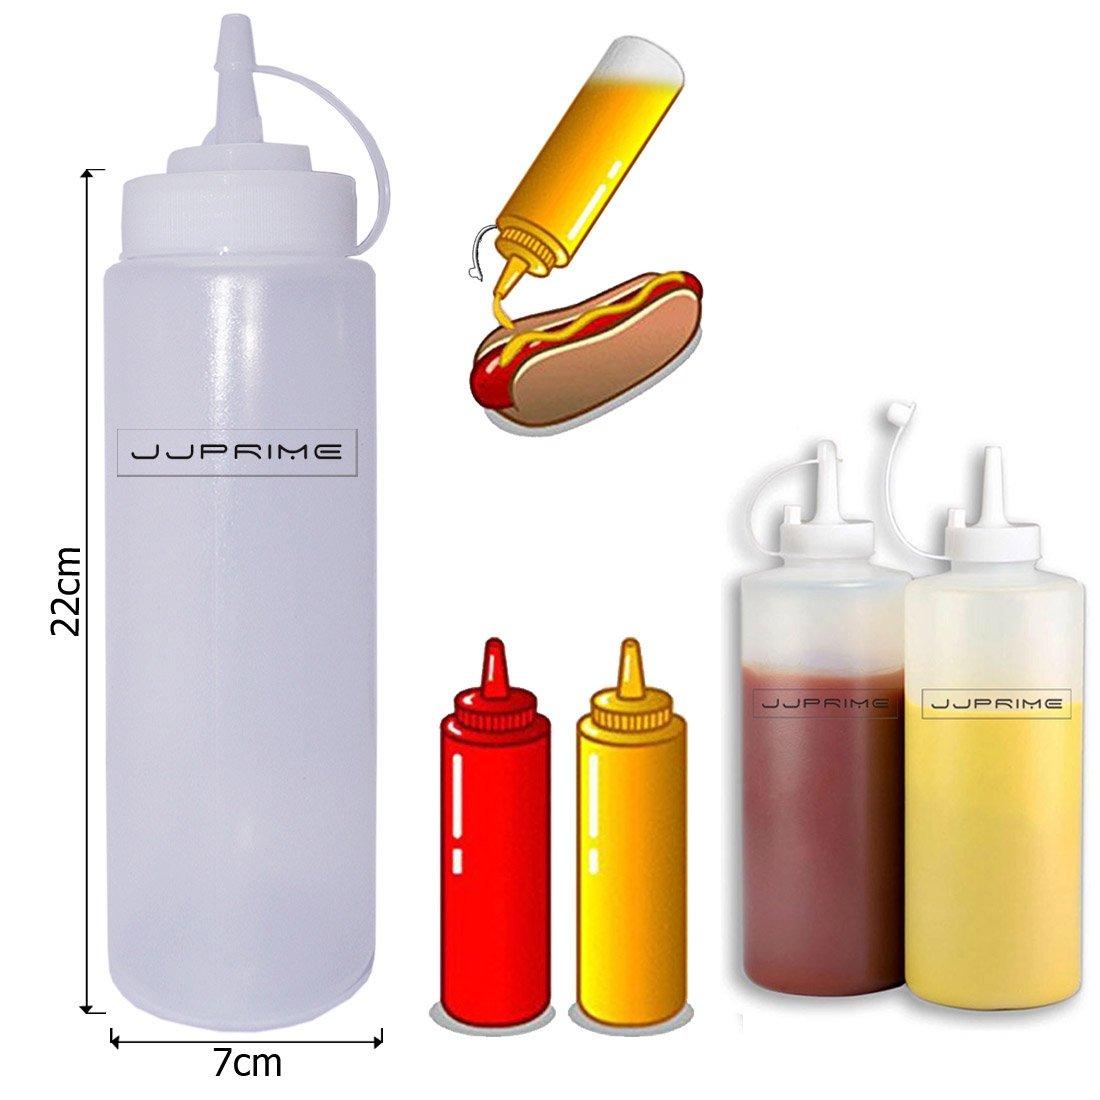 Jjprime–Flash vendita–6pezzi di plastica trasparente Squeeze bottiglia condimento dispenser ketchup senape maionese chili salsa aceto bottiglie coperchio Cap, 24 Oz / 700ml JJOnlineStore